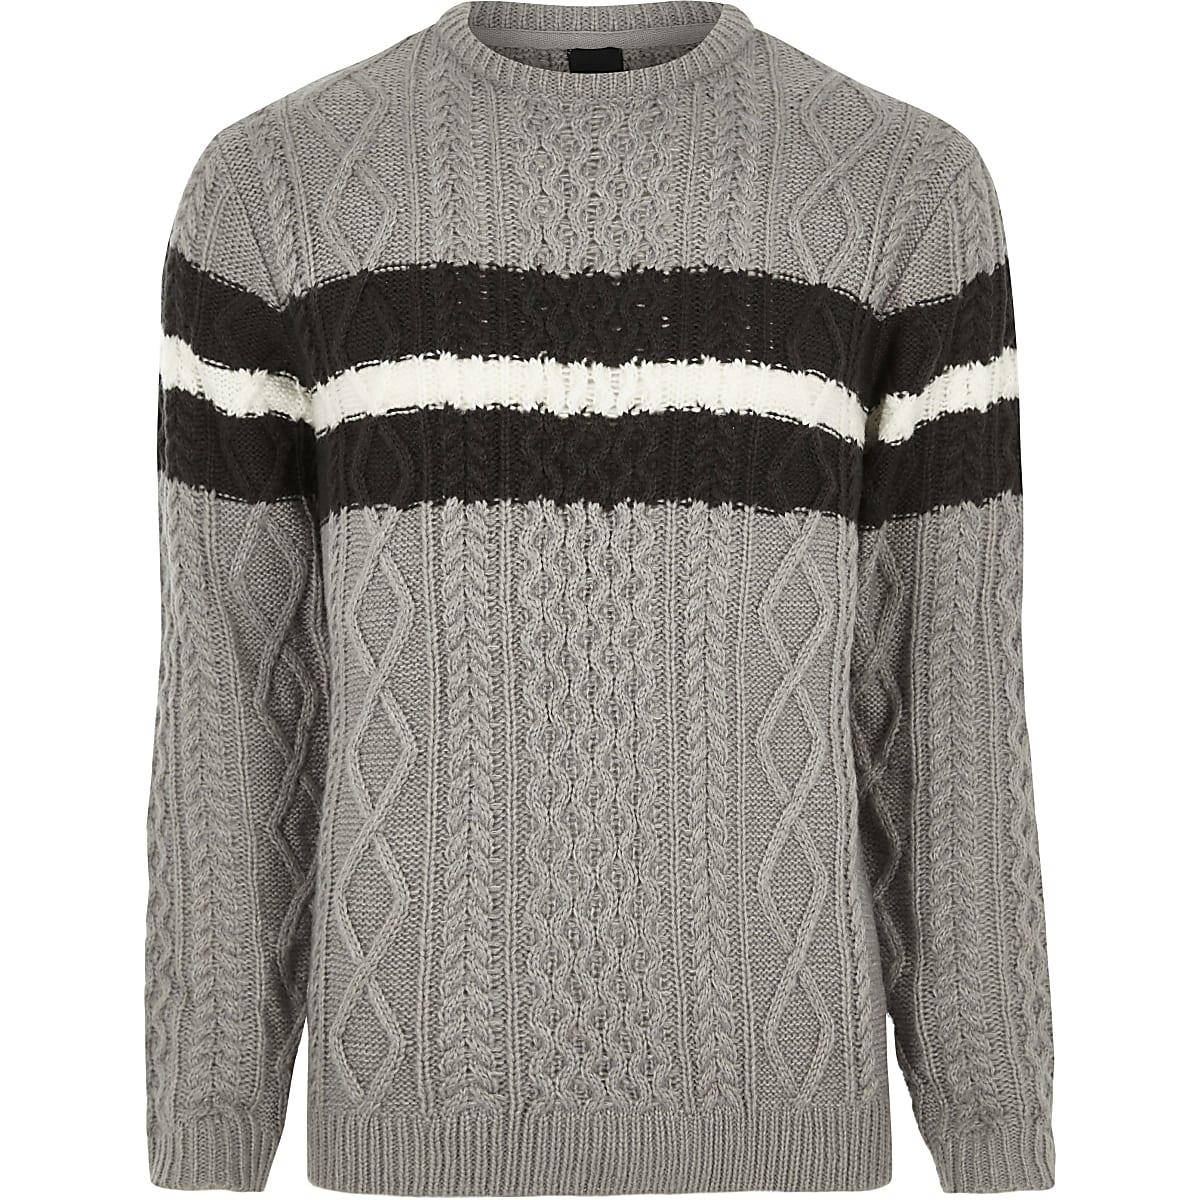 Grey cable knit block stripe knit jumper